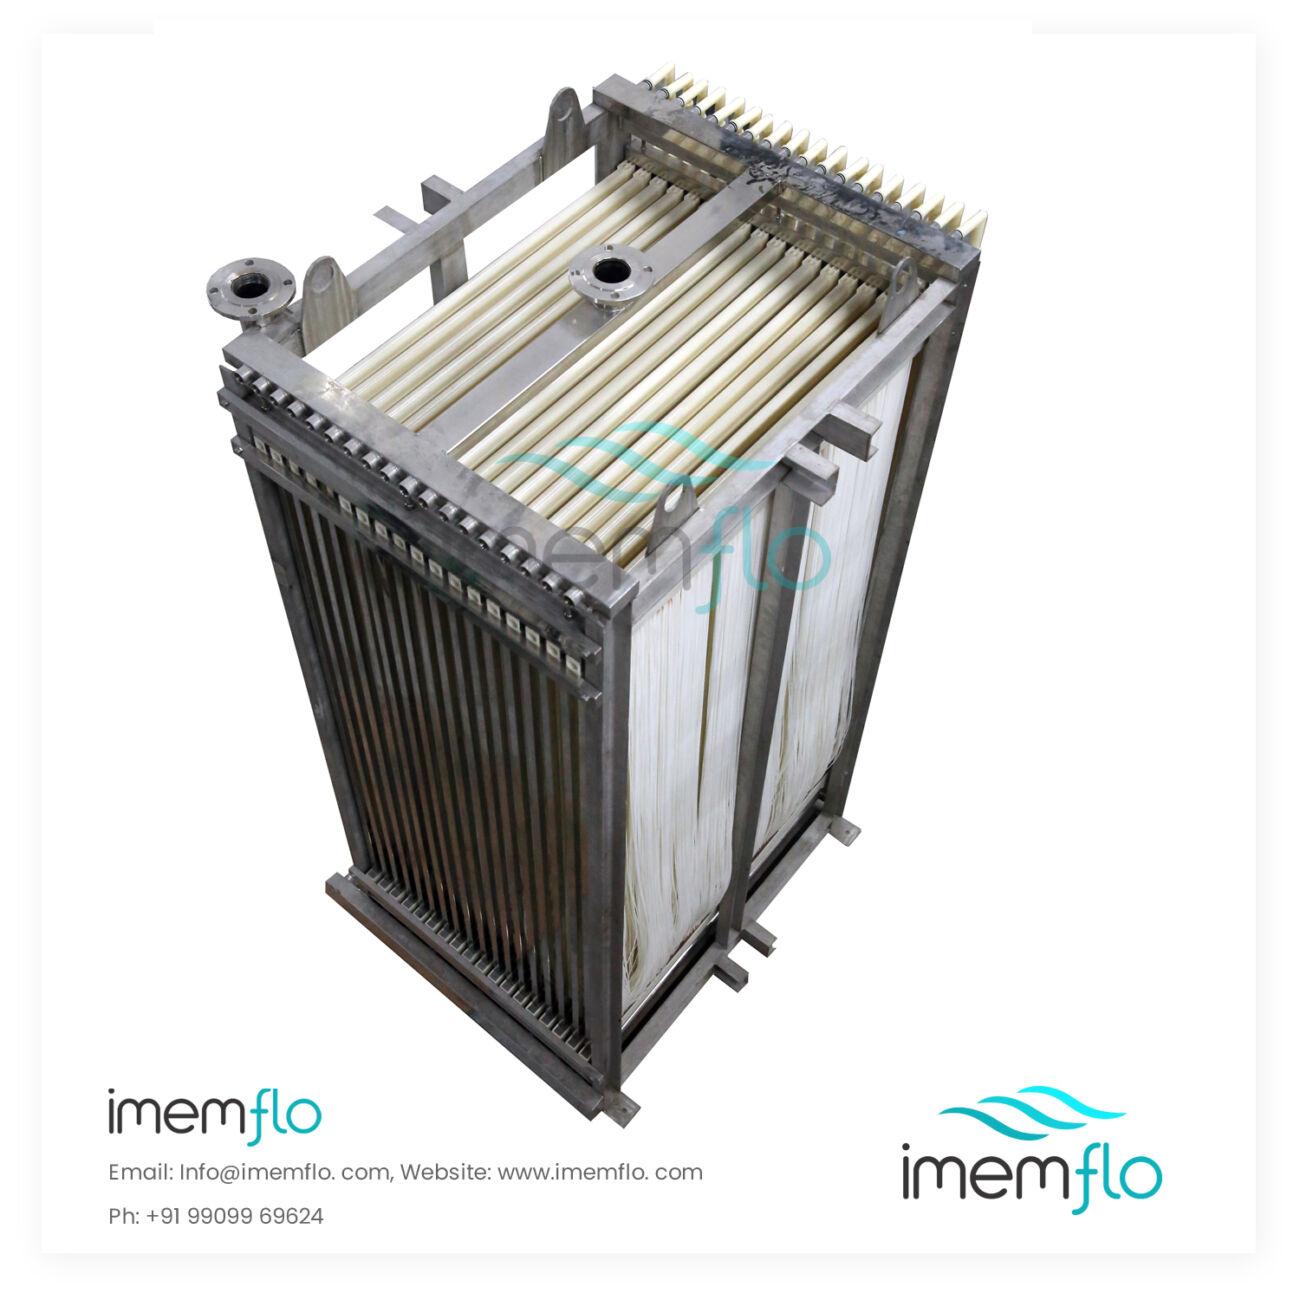 Imemflo MBR Membrane hollow fibre product